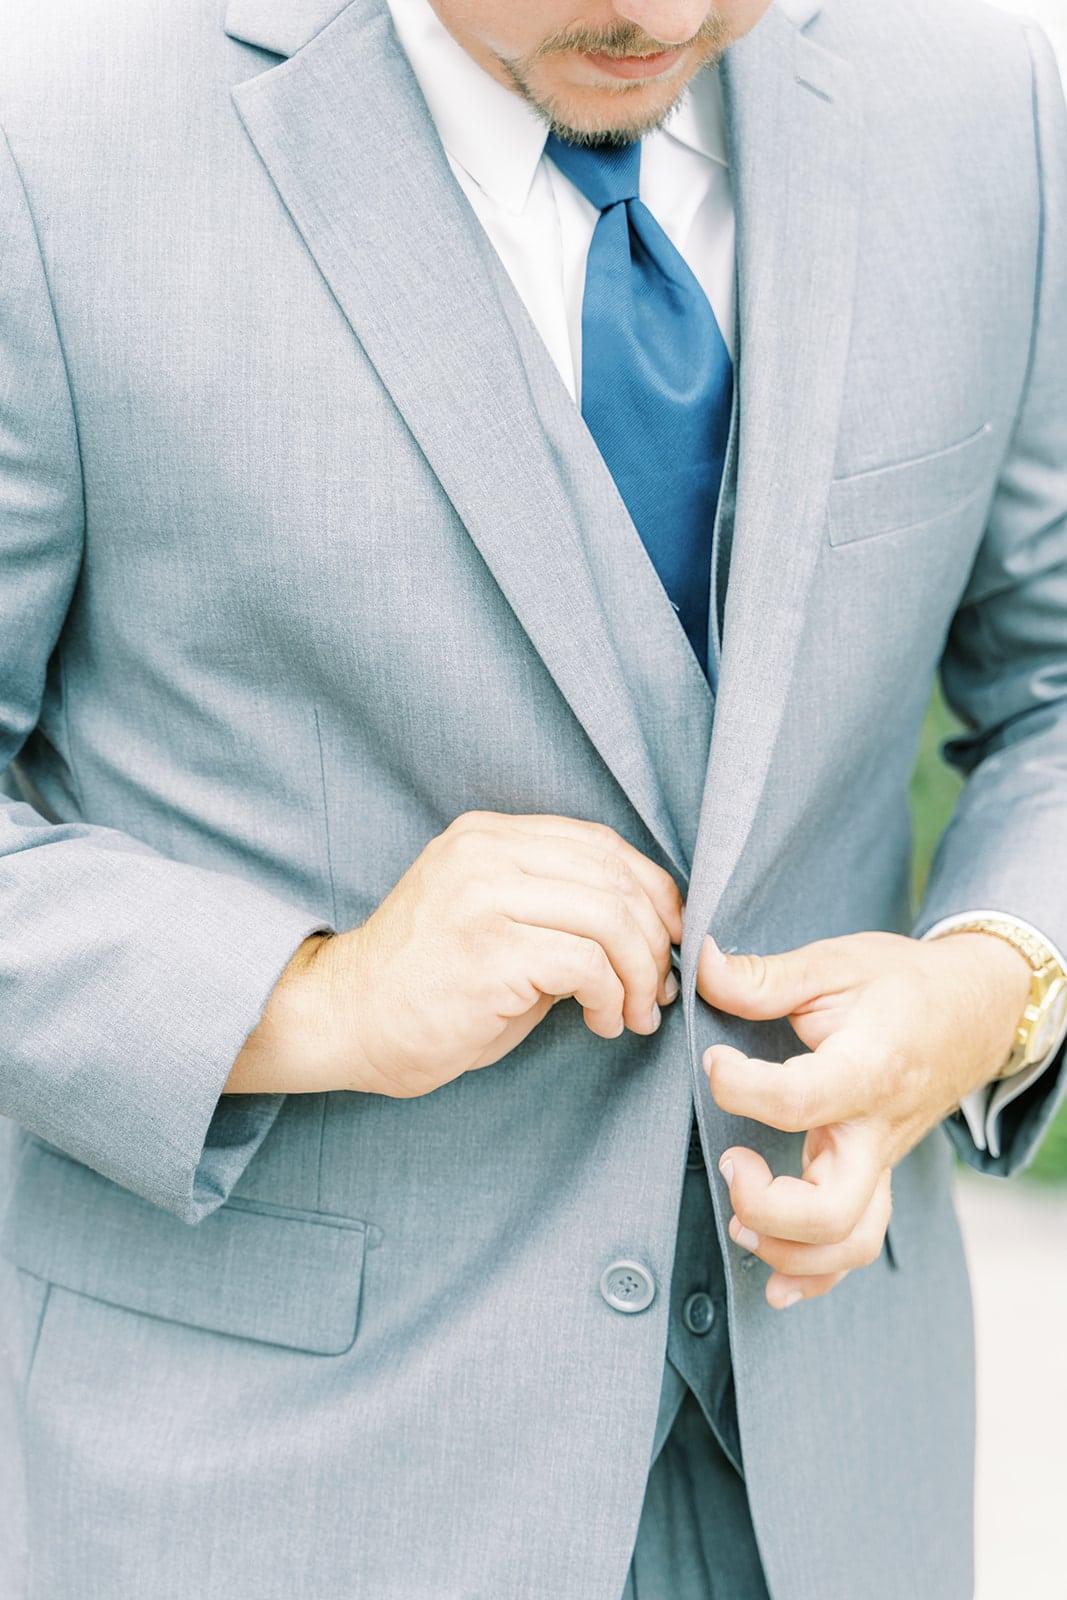 Gray wedding tuxedo with blue tie | Nashville Bride Guide